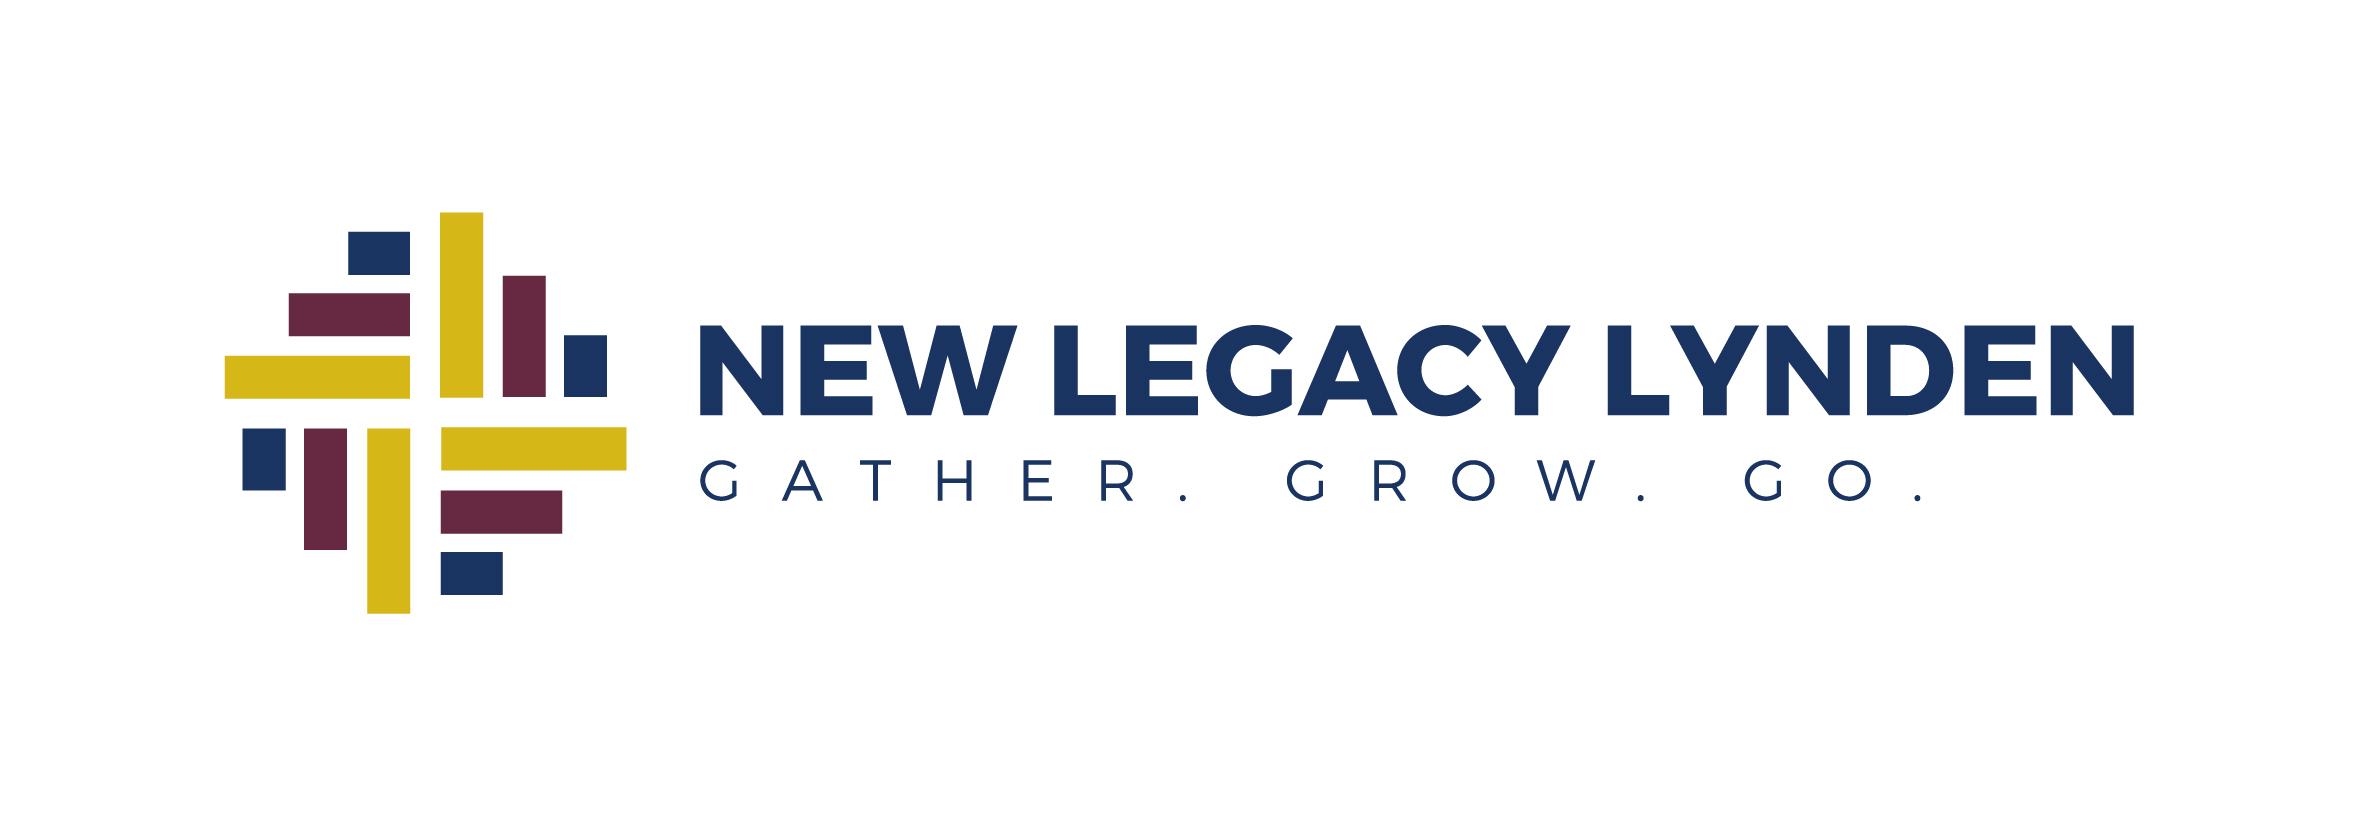 New Legacy Lynden Logo FINALS